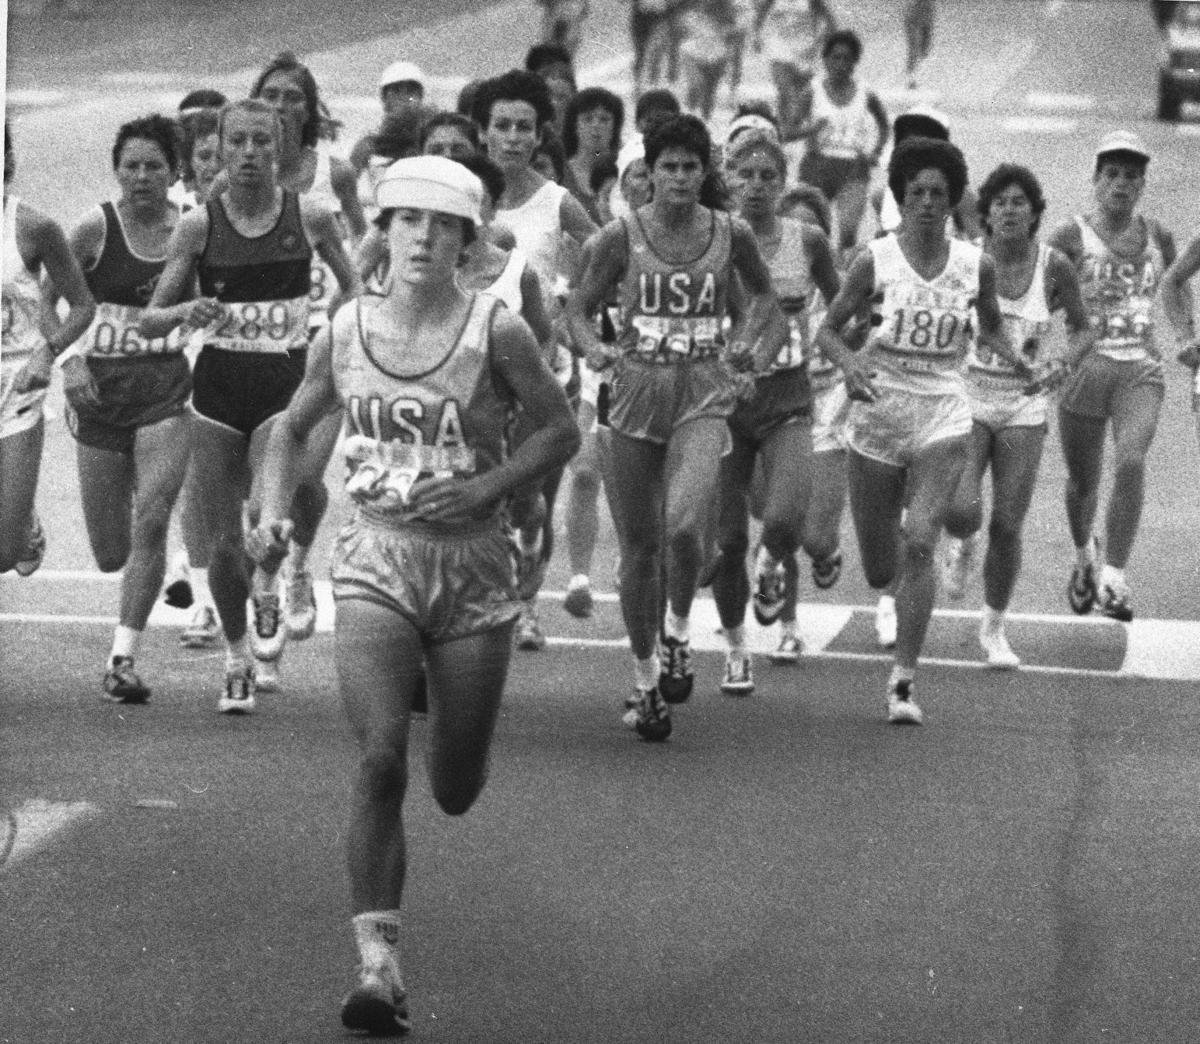 Joan Benoit Samuelson wins 1984 Olympic women's marathon